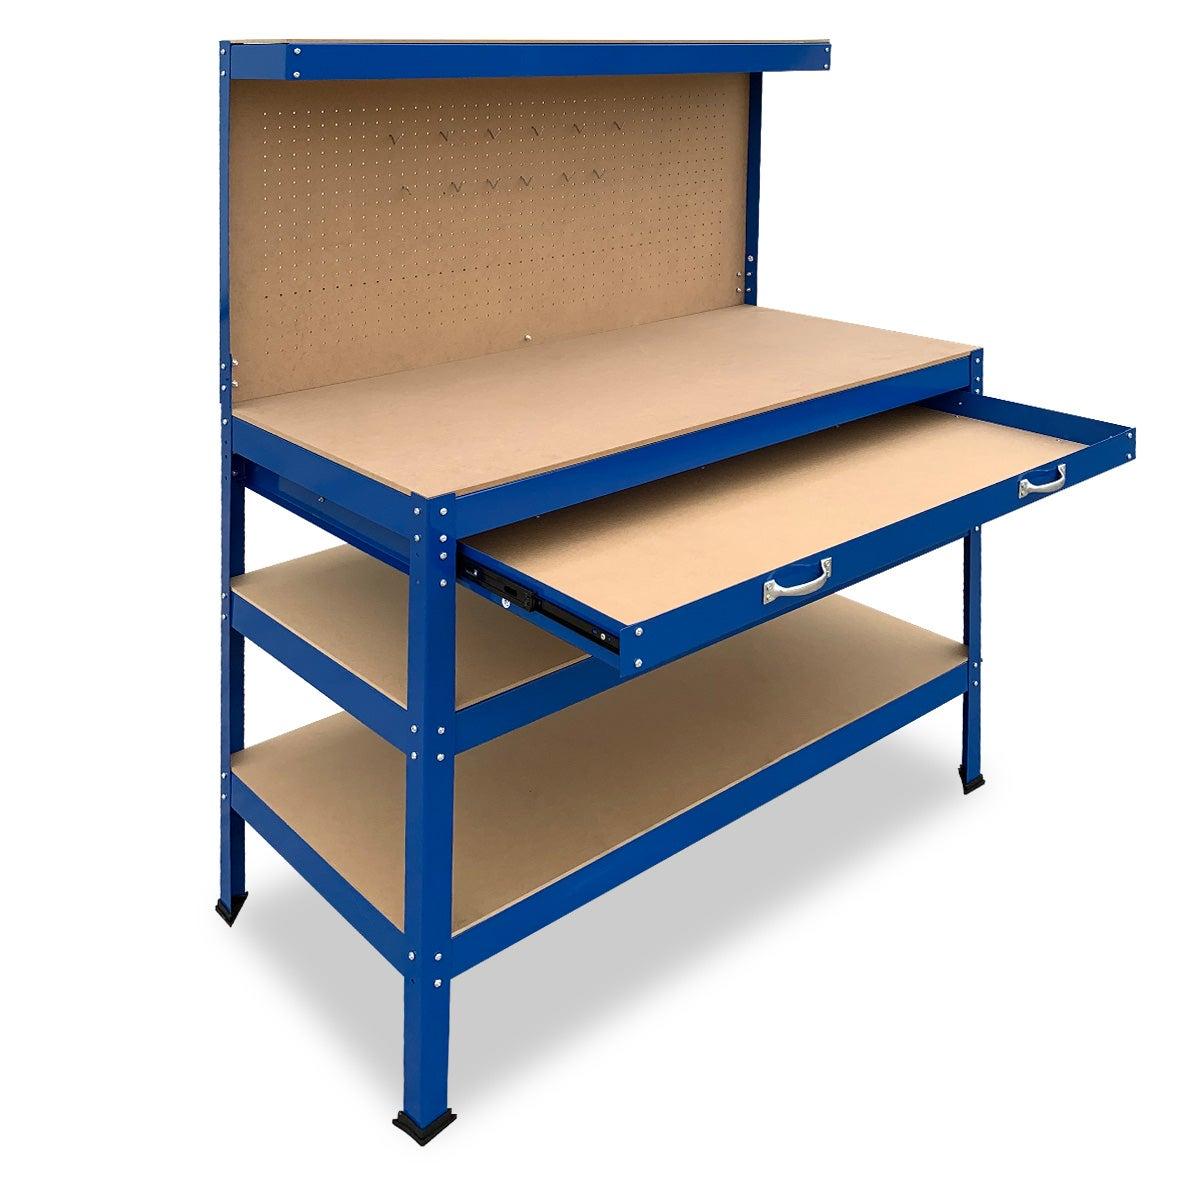 3-Layered Work Bench Garage Storage Table Tool Shop Shelf ...